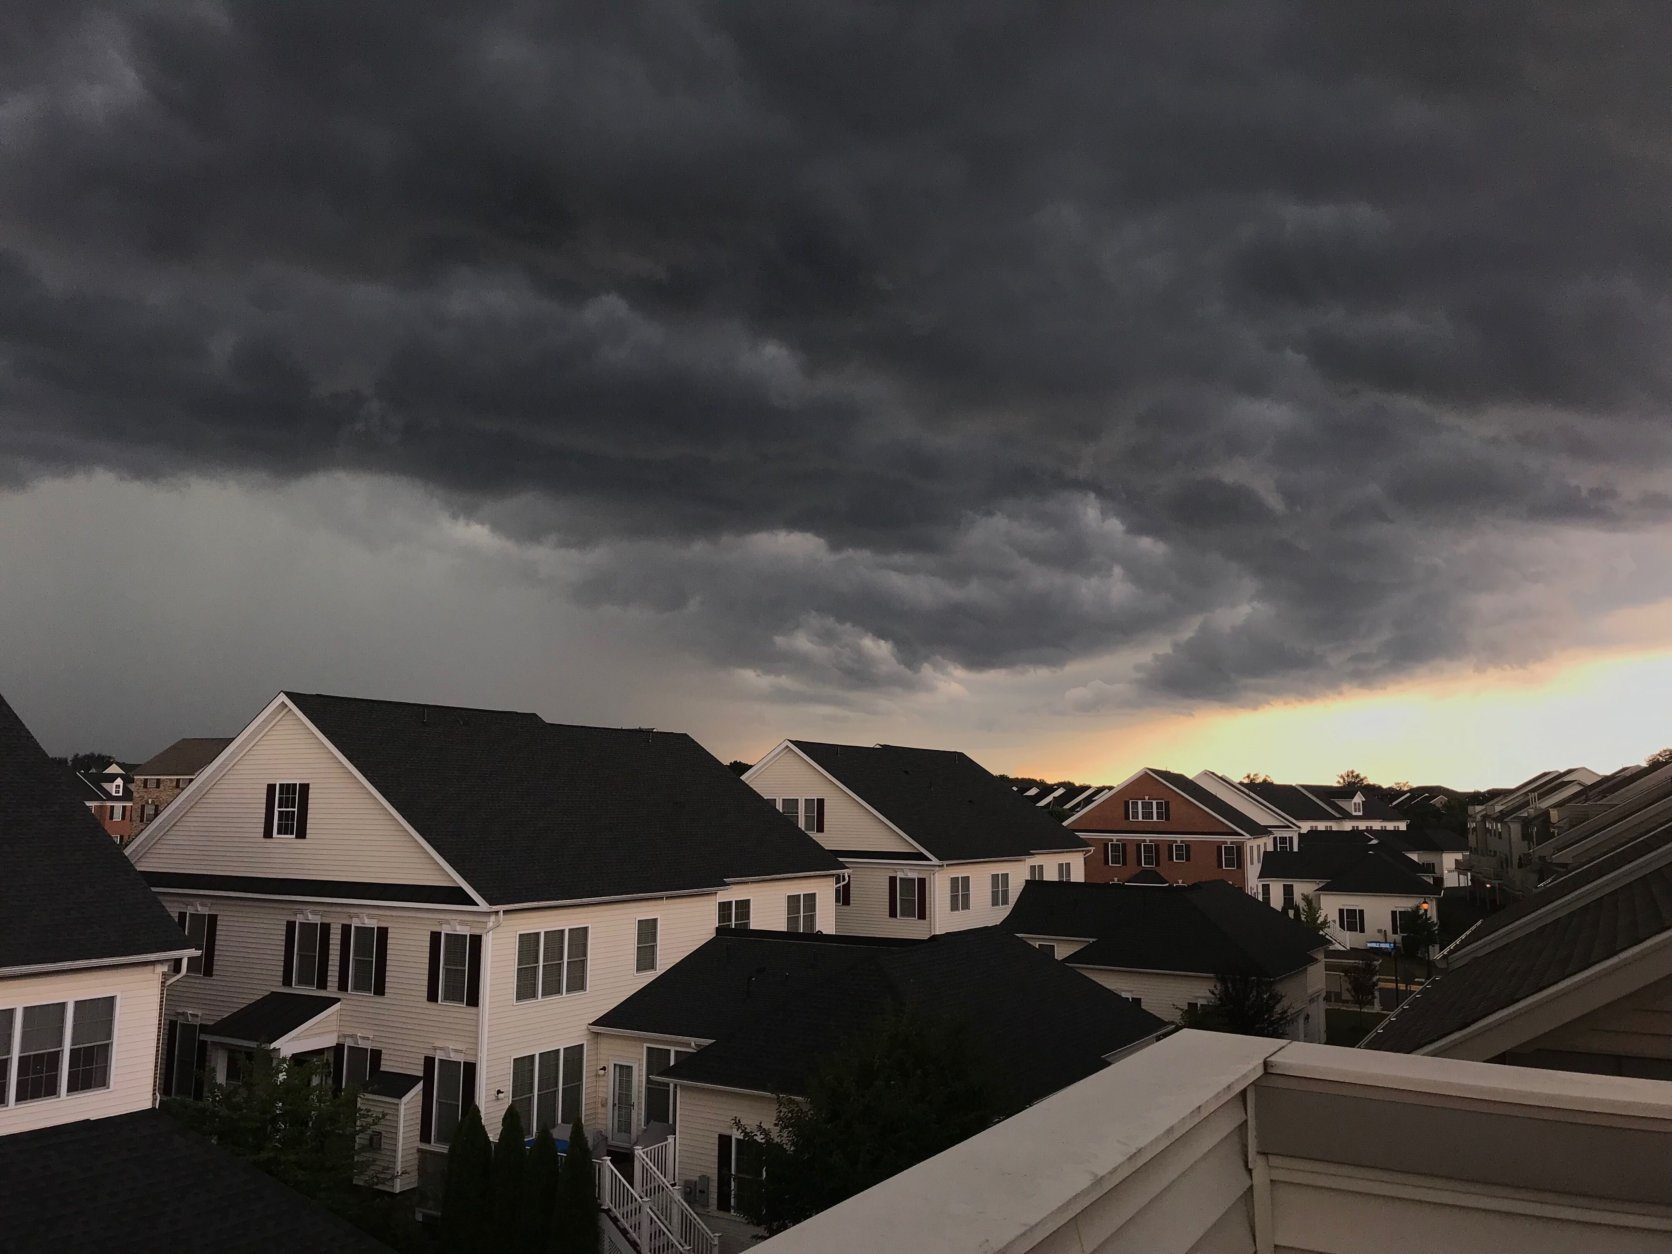 storm, ashburn